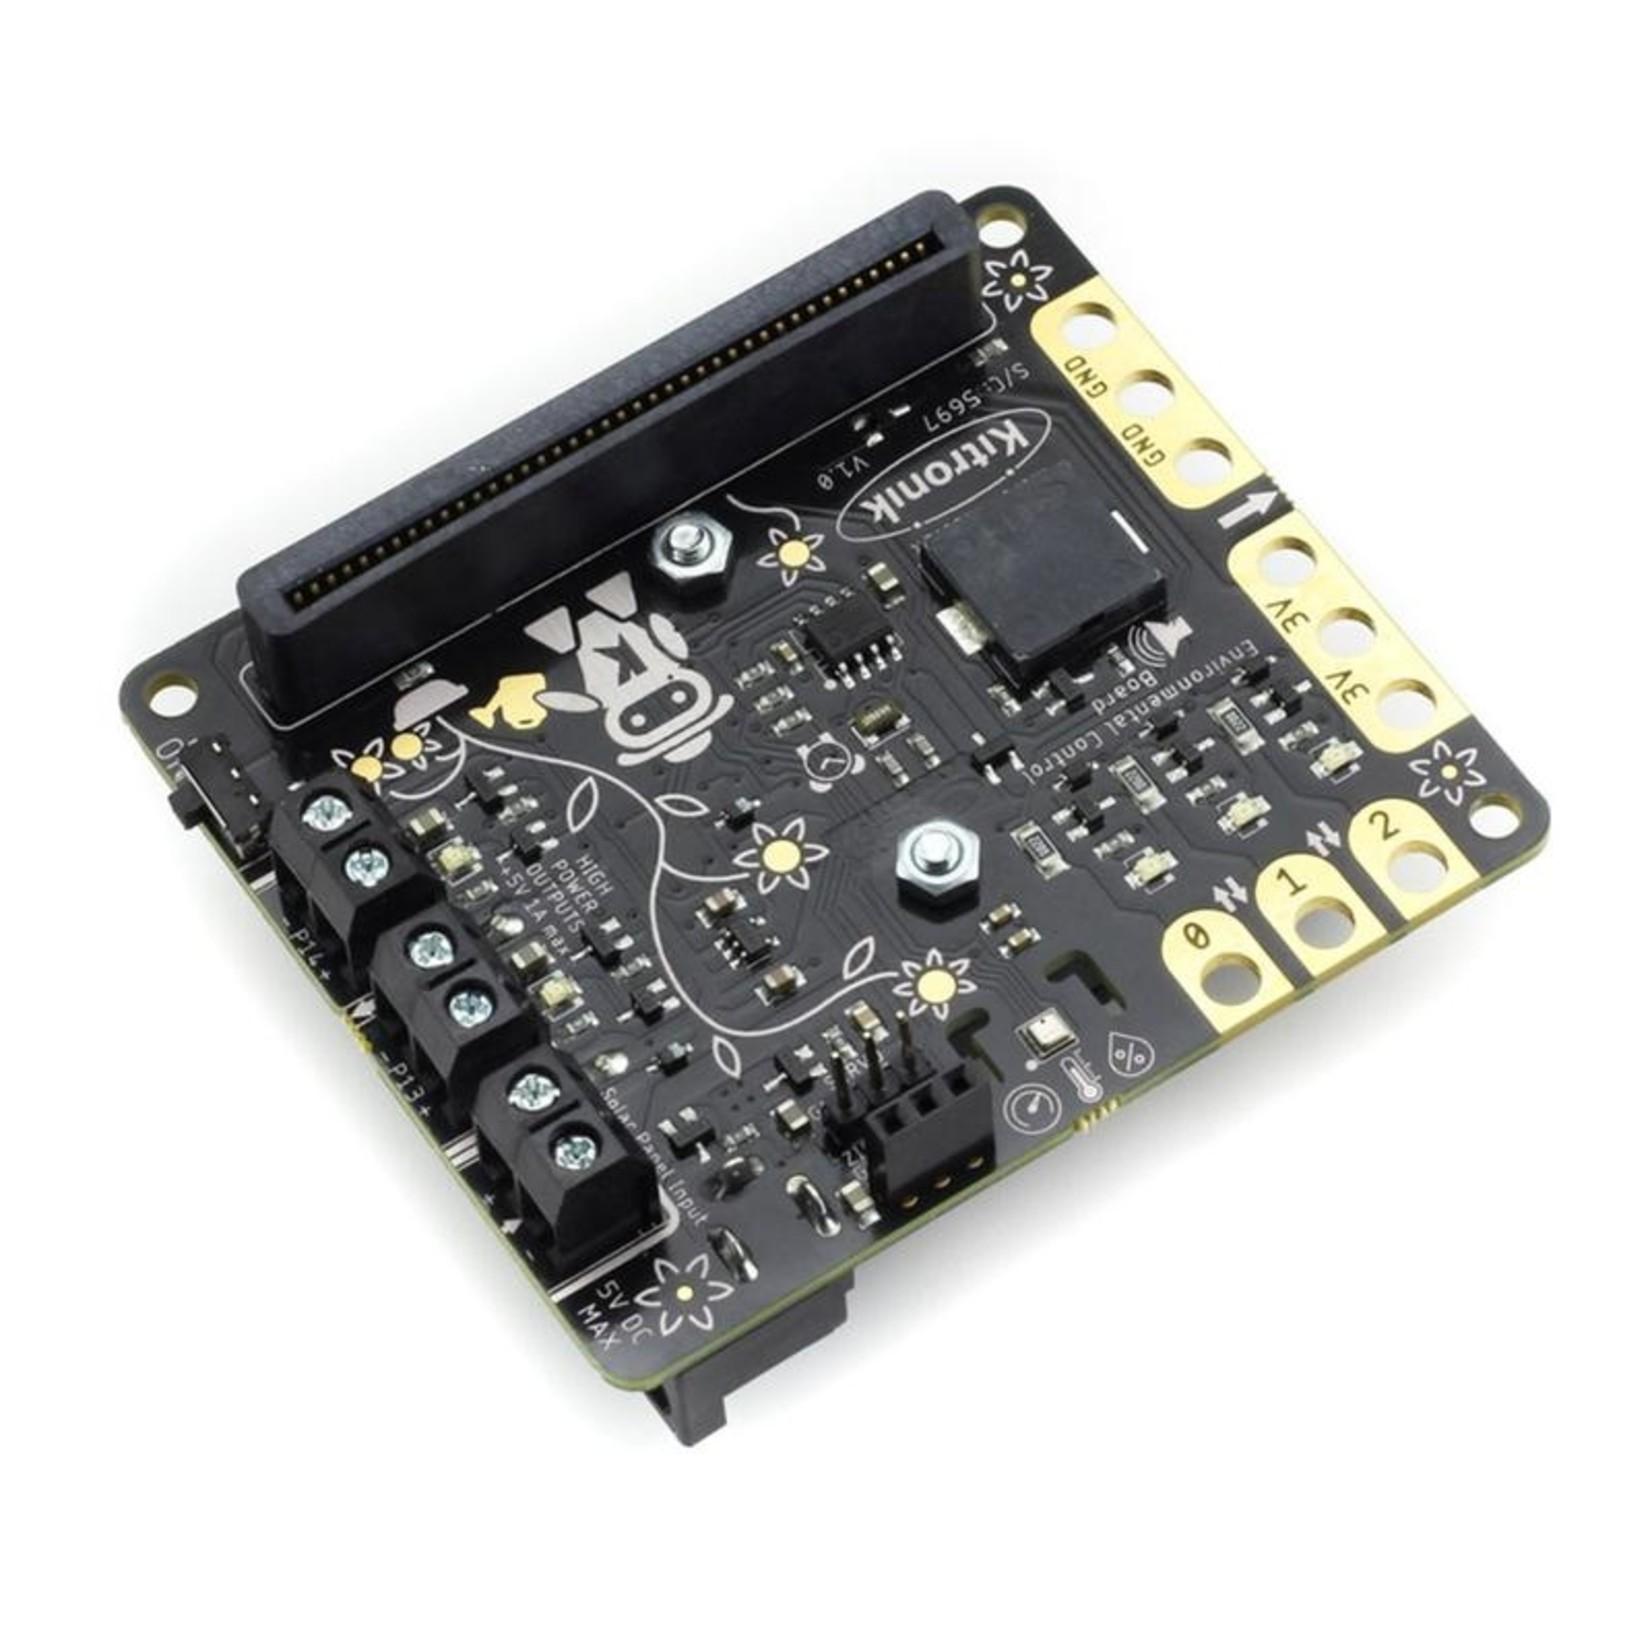 Kitronik Environmental Control Board for BBC micro:bit